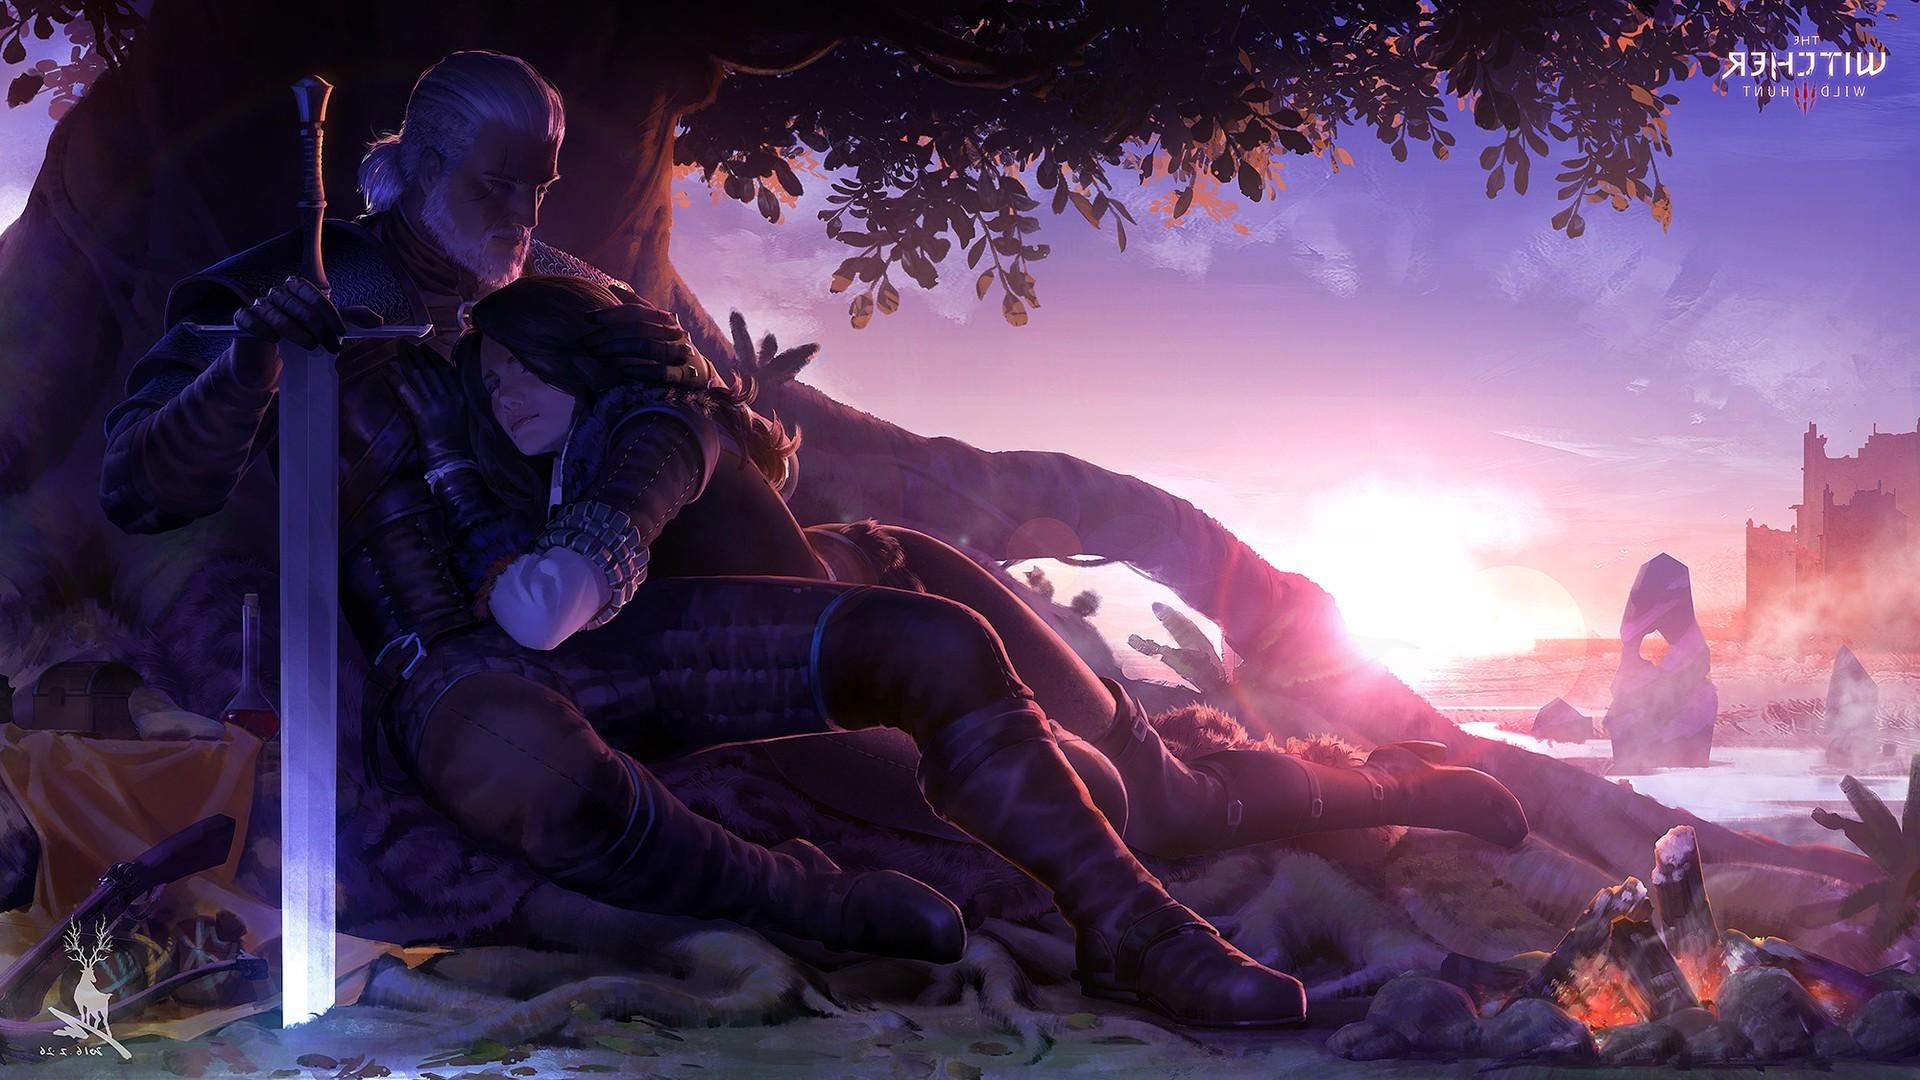 fantasy art The Witcher mythology screenshot 1920x1080 px